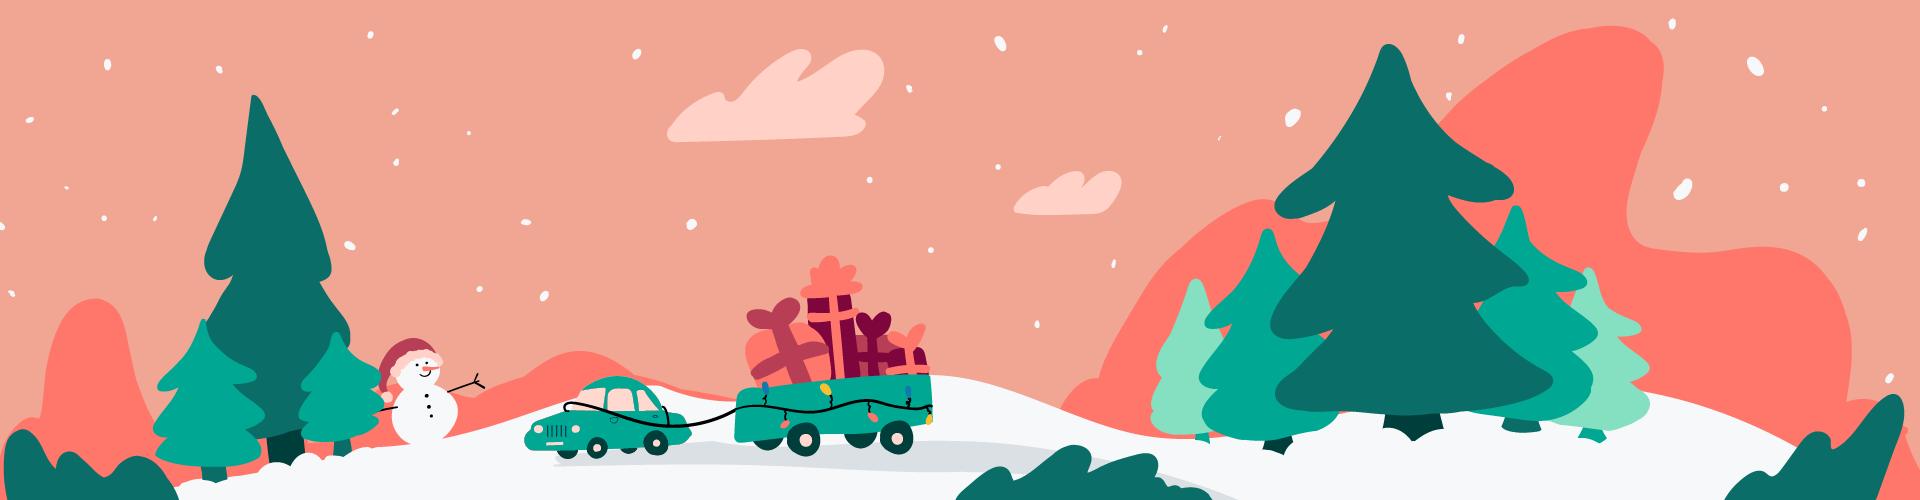 Landscape_Christmas02_v03-01